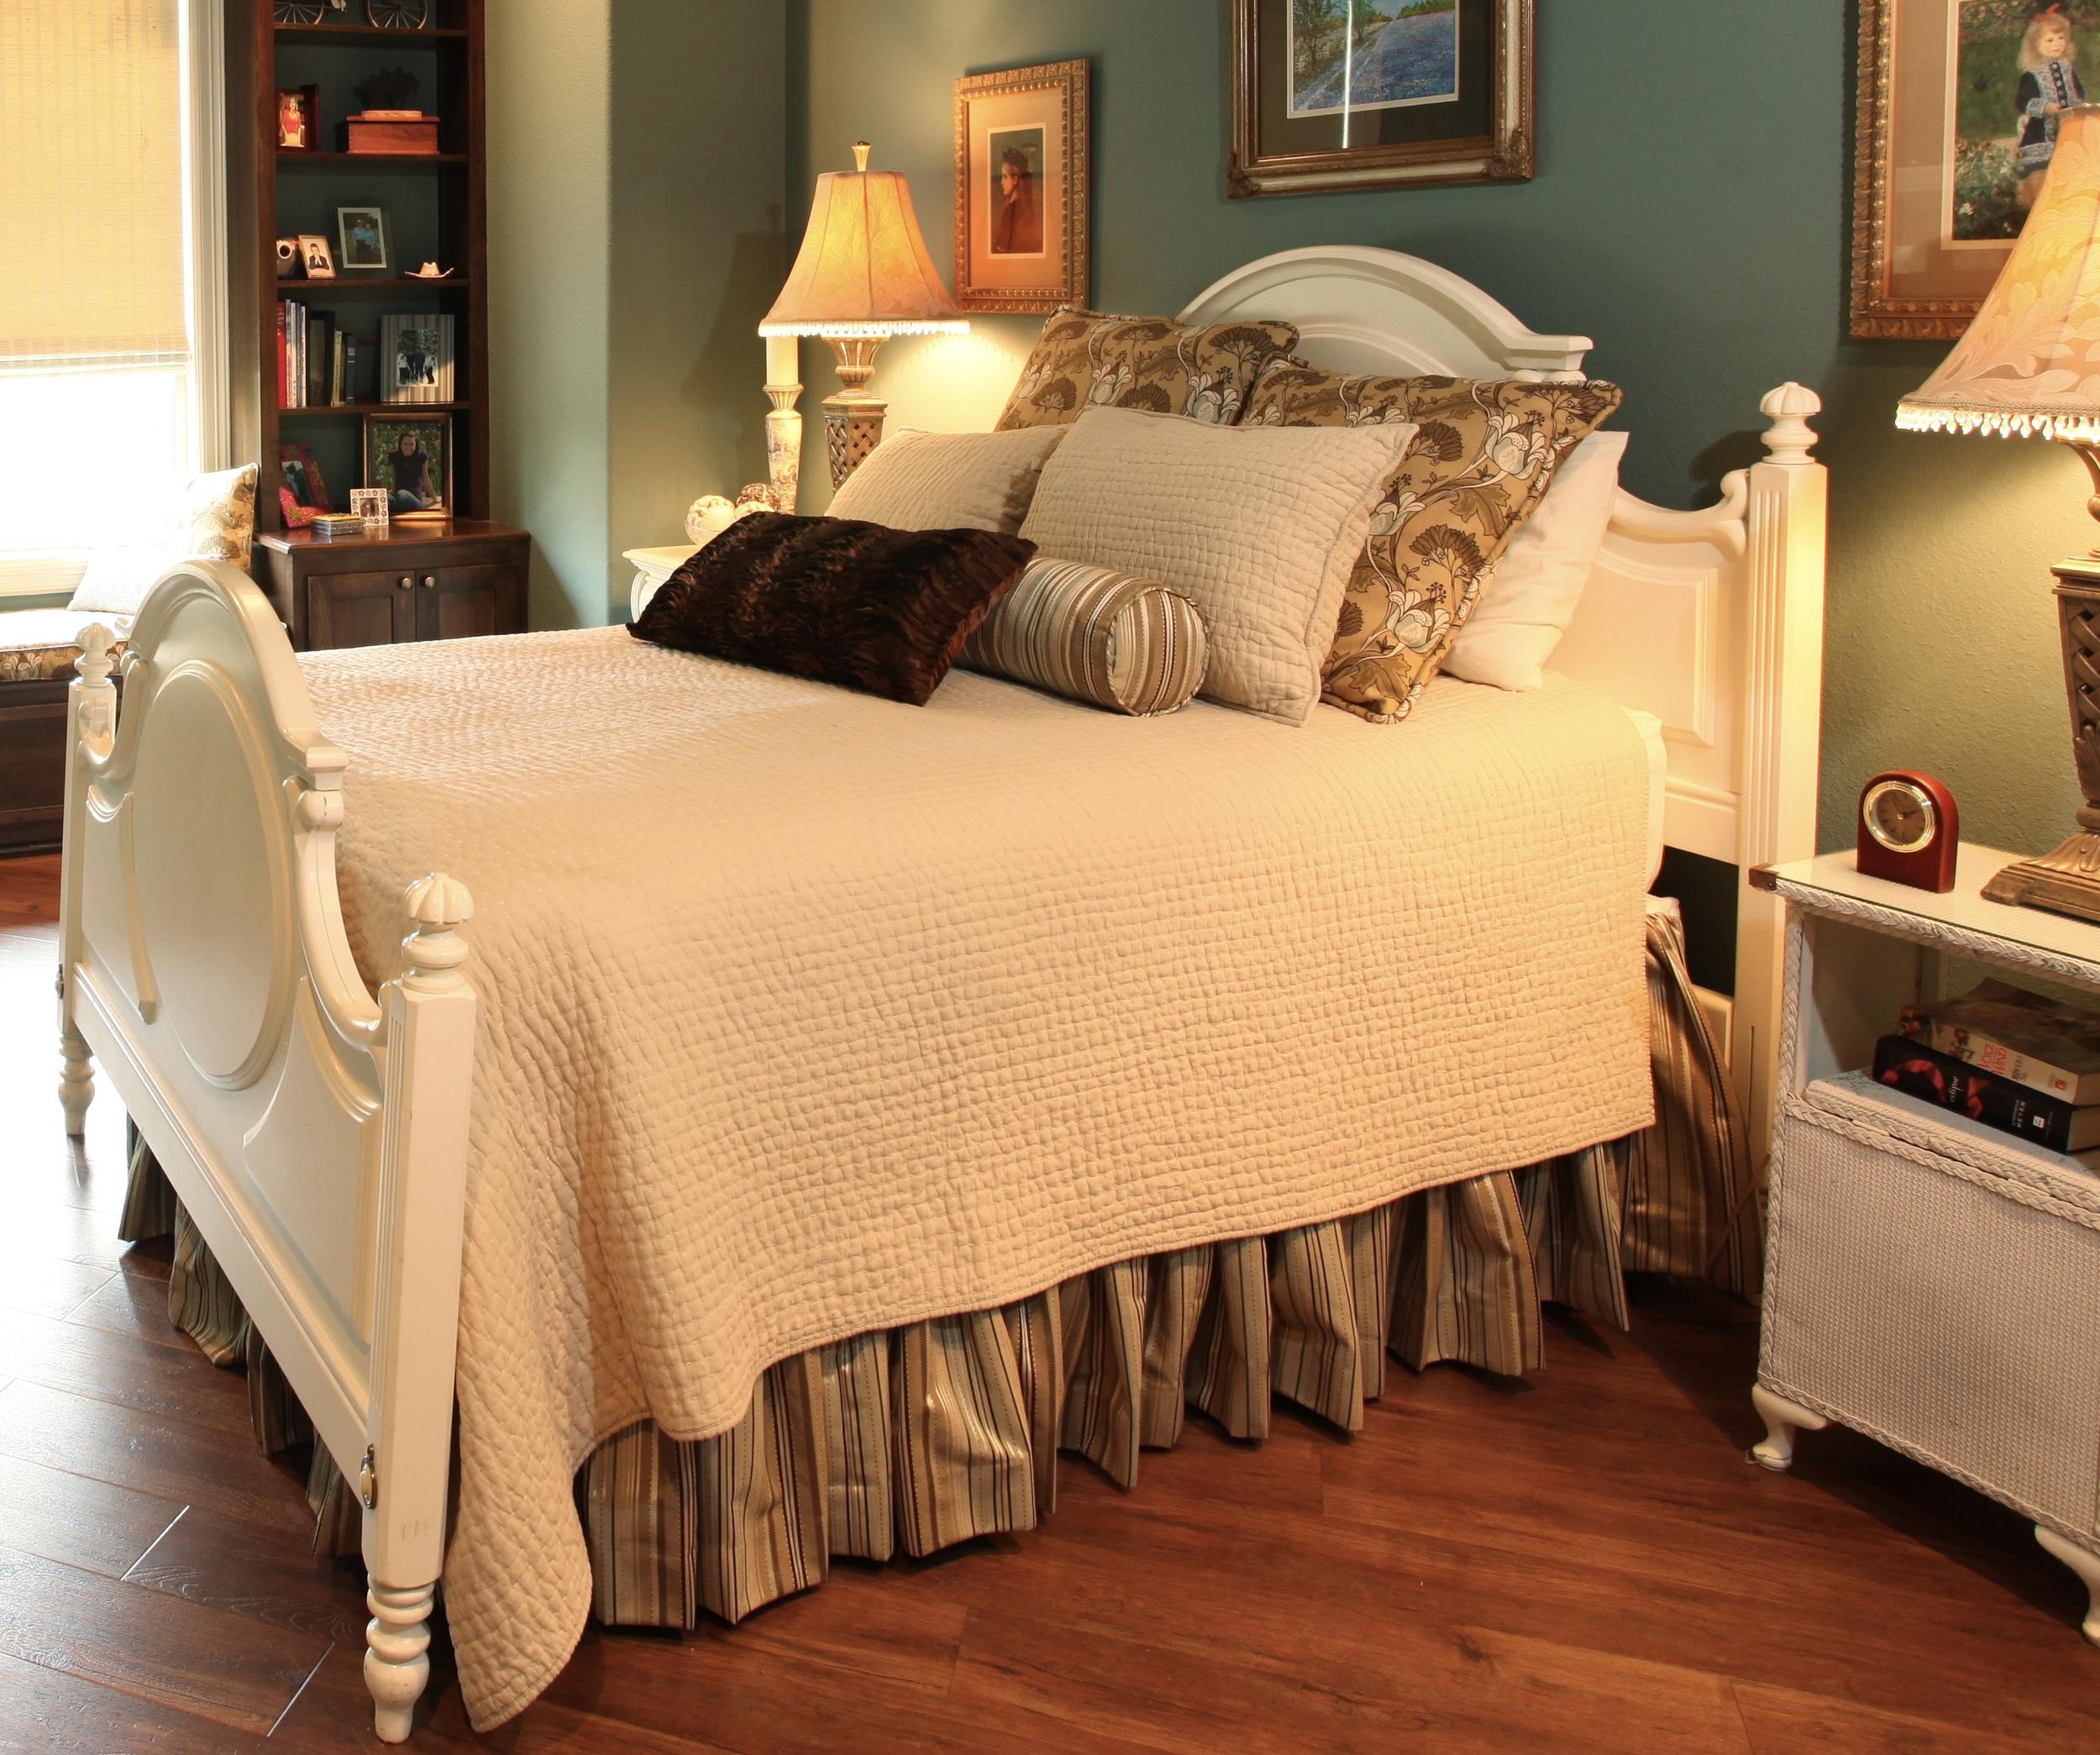 jillornelas.com/how-to-make-your-bed.jpg